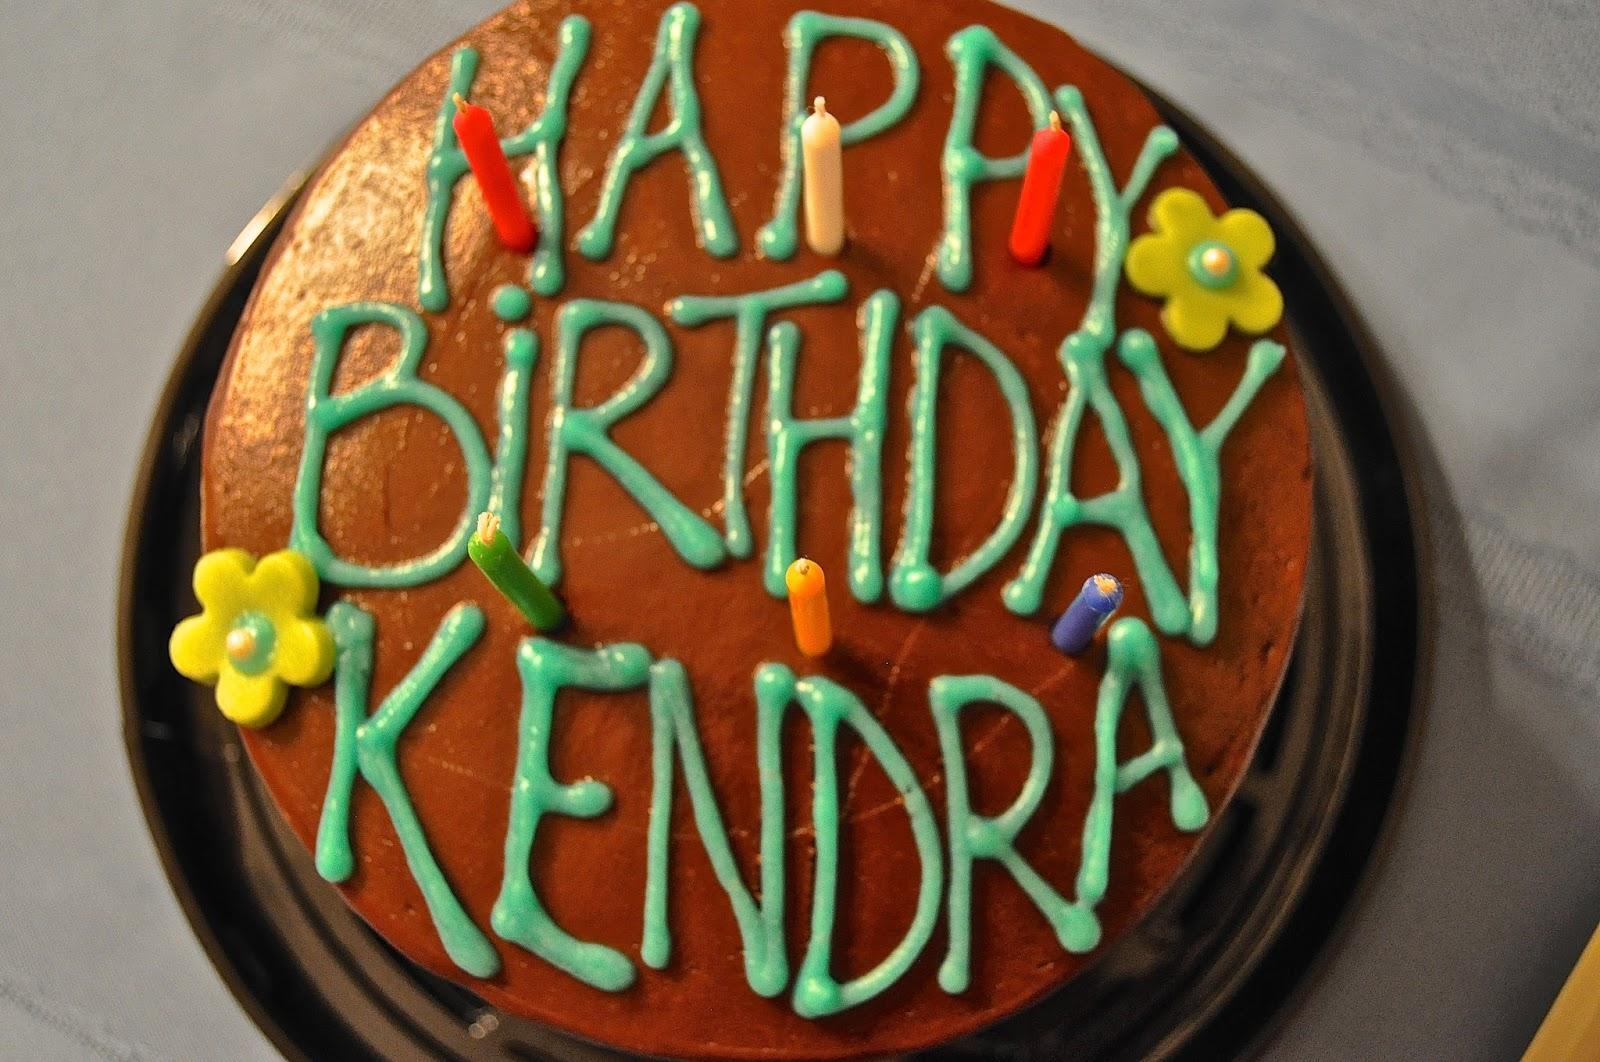 Quinoa Salad Chocolate Cake And A Happy Birthday To Me Urban Tarte